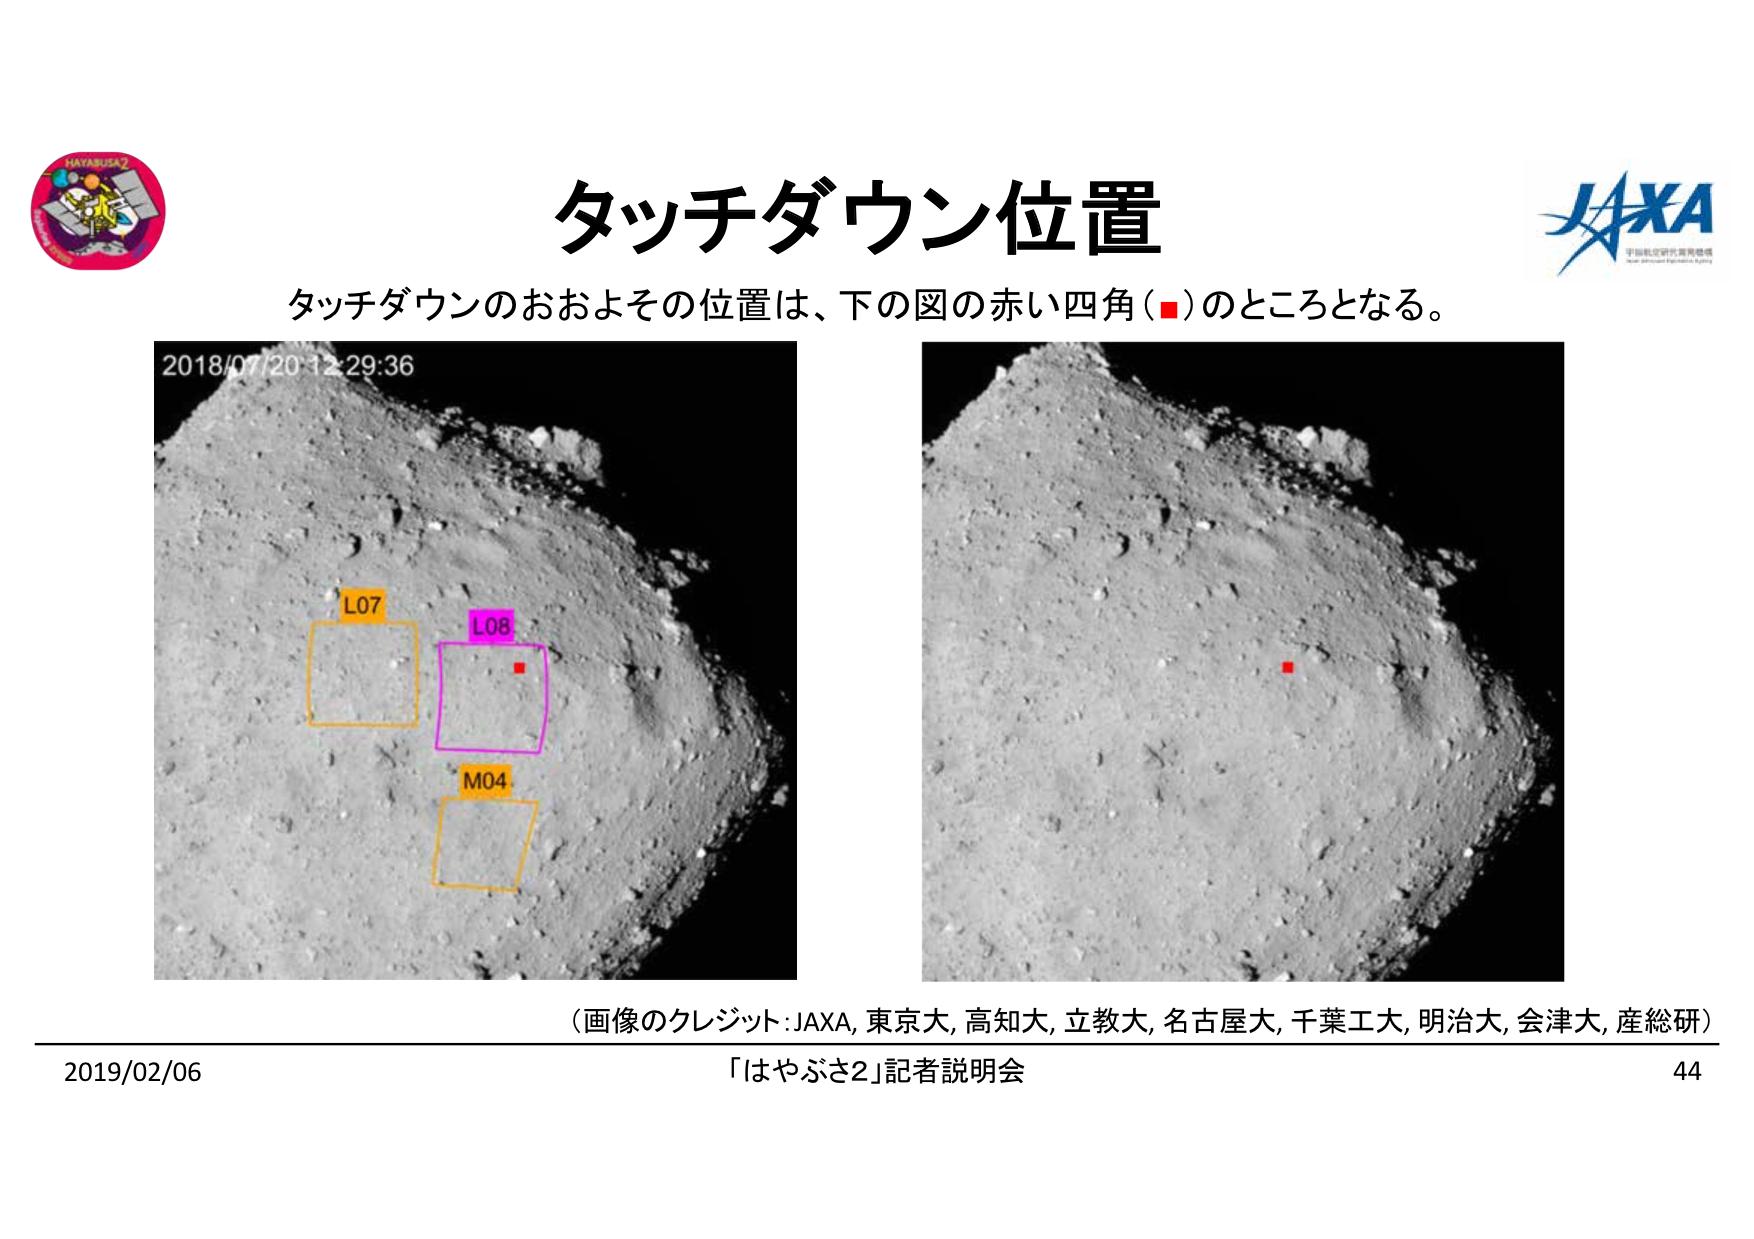 f:id:Imamura:20190204175538p:plain